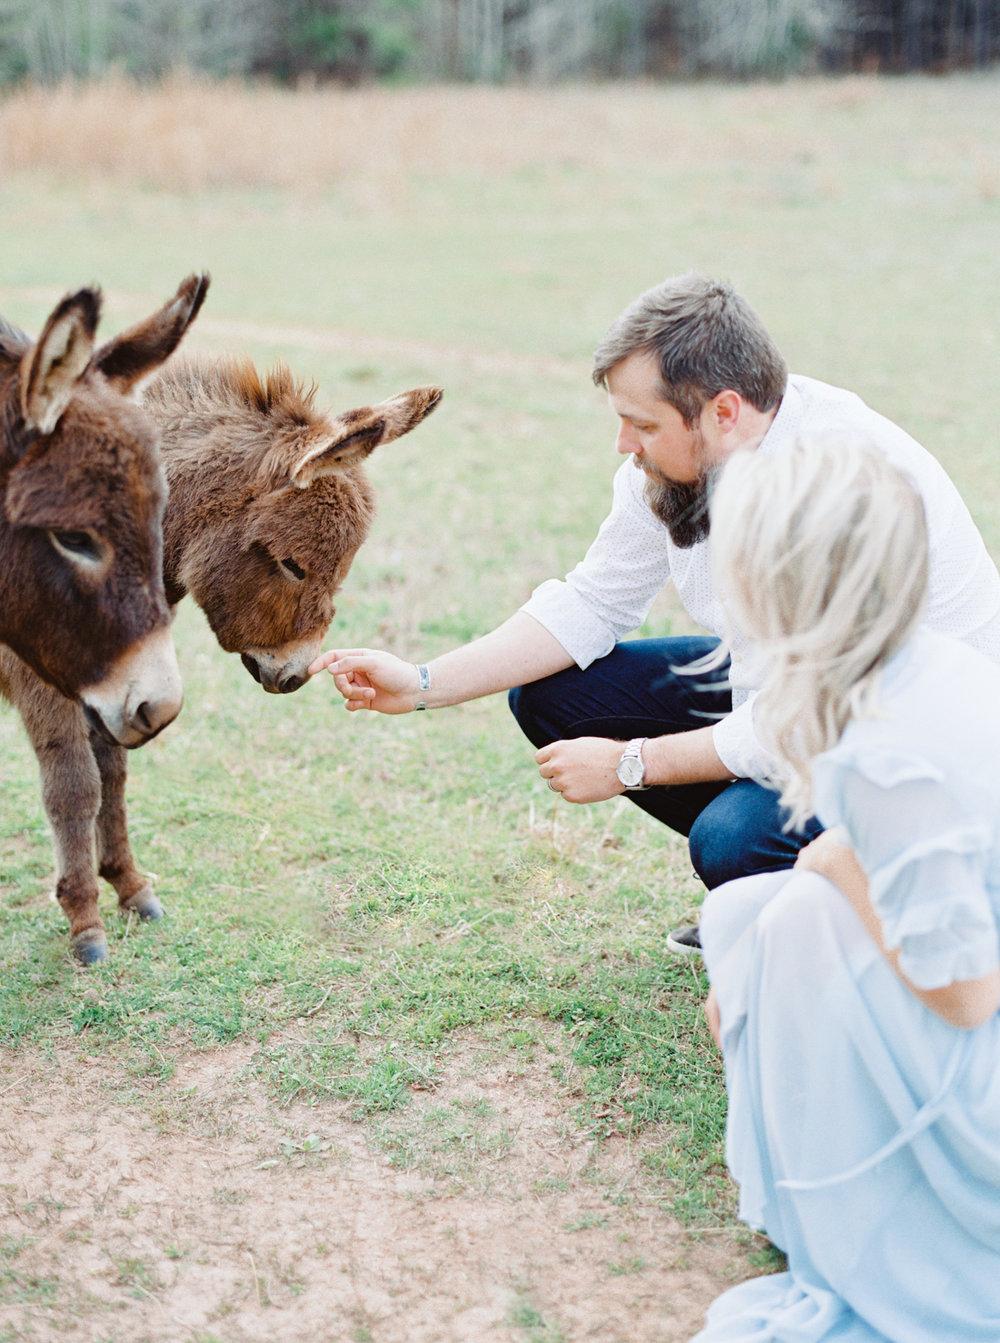 hannah forsberg atlanta wedding photographer whitney spence anniversary session with miniature donkeys and horse-10.jpg